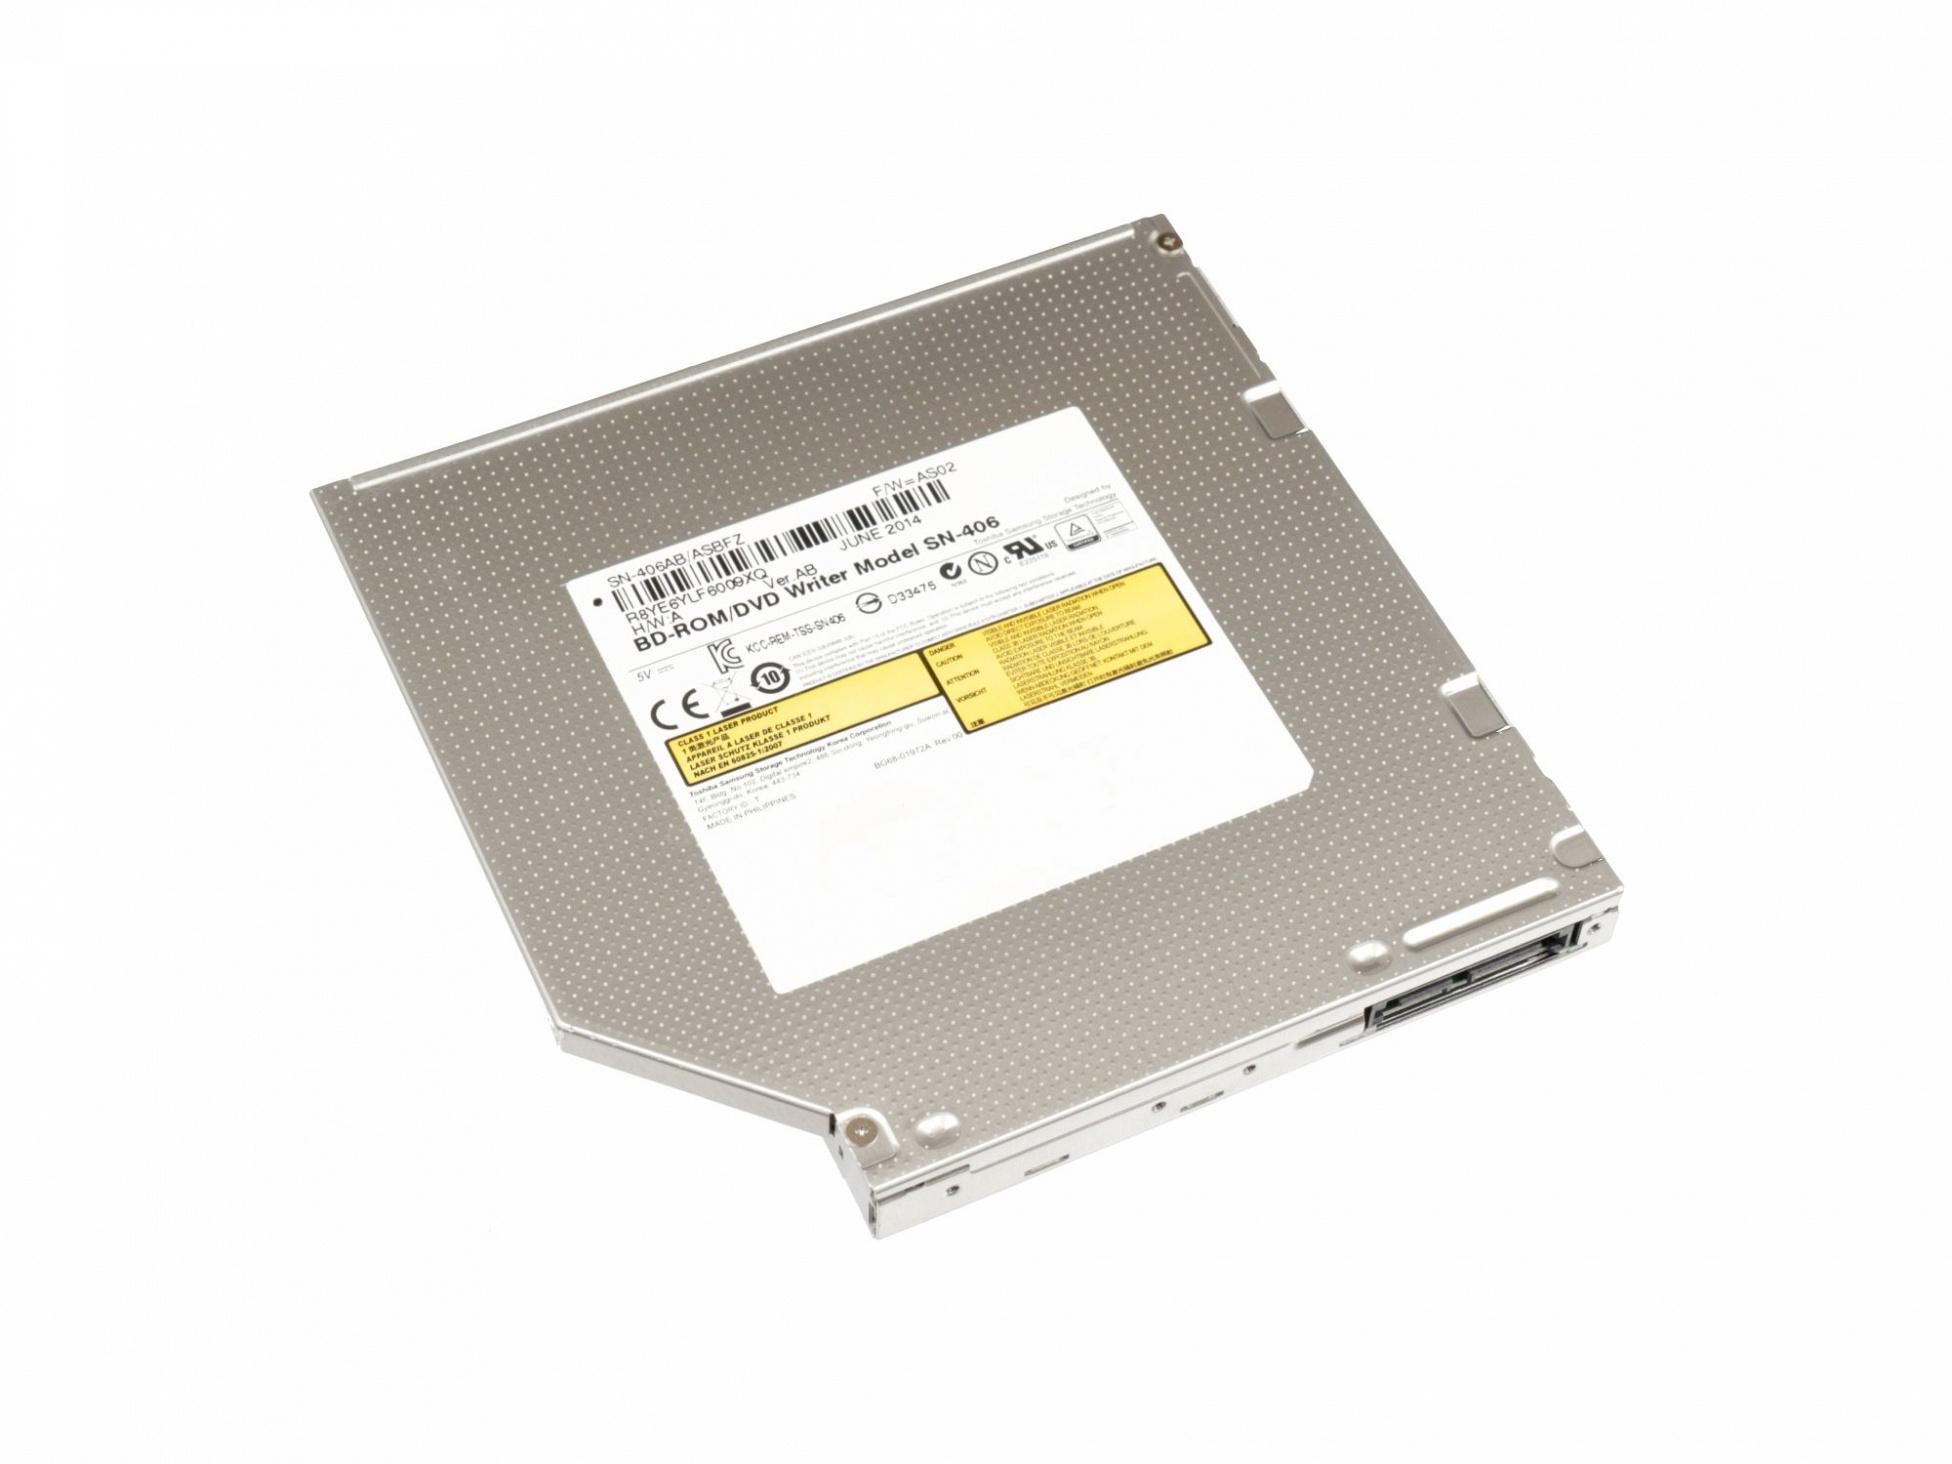 DVD / Blu-Ray Combo Laufwerk für Wortmann Terra Mobile 1509 (1220111)